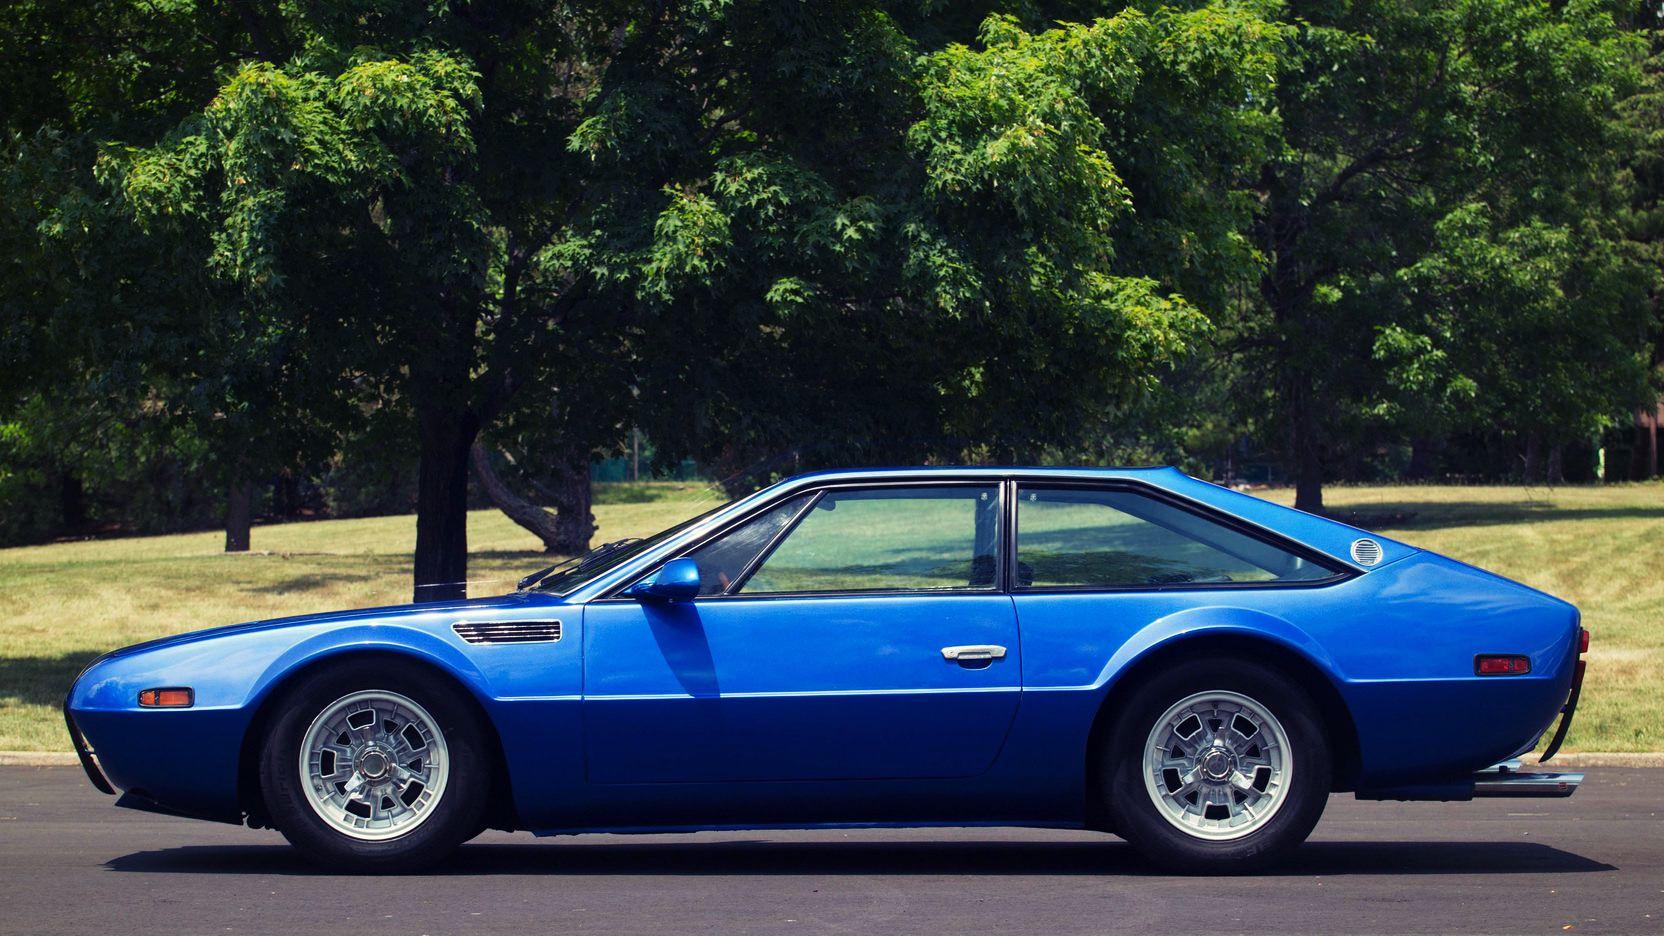 HD Quality Wallpaper | Collection: Vehicles, 1664x936 Lamborghini Jarama